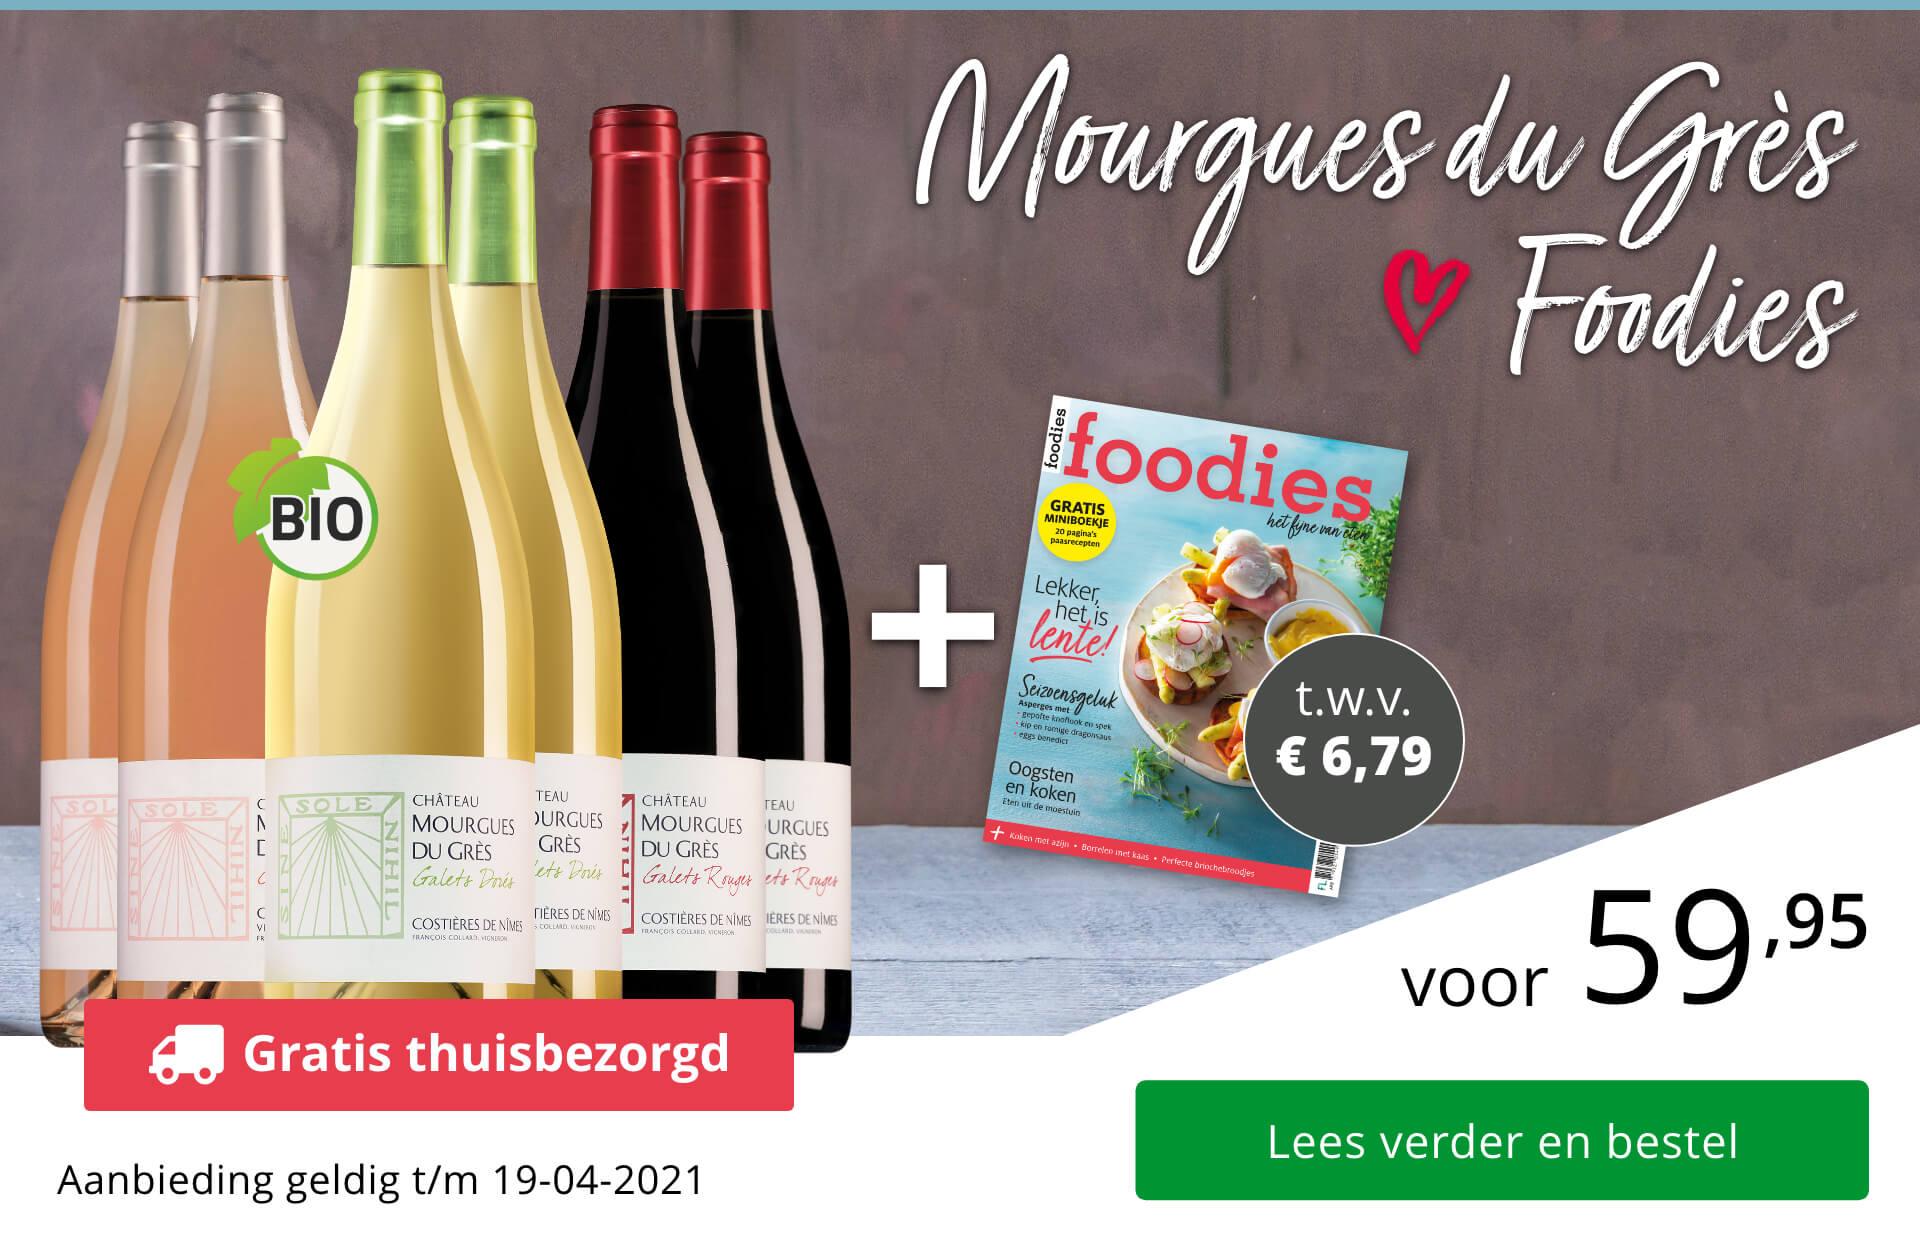 Wijnpakket Mourgues du Grès + Foodies-magazine